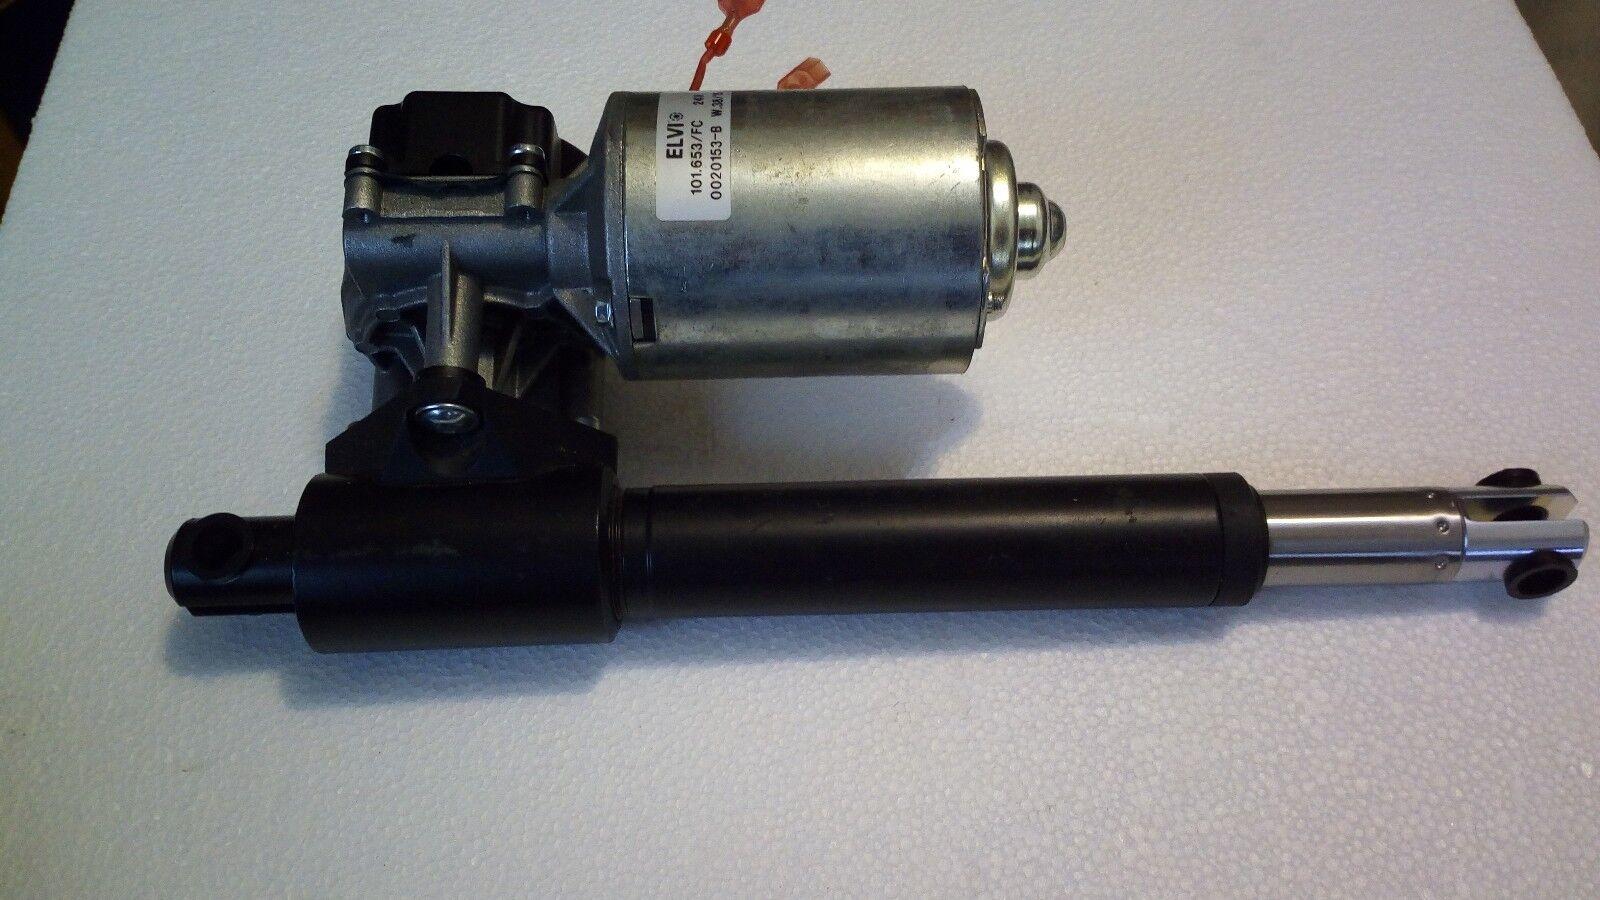 LINAK 24VDC 24VDC 24VDC Hubmotor  Getriebemotor  Lienearantrieb 40mm Hub | Online  31ba05